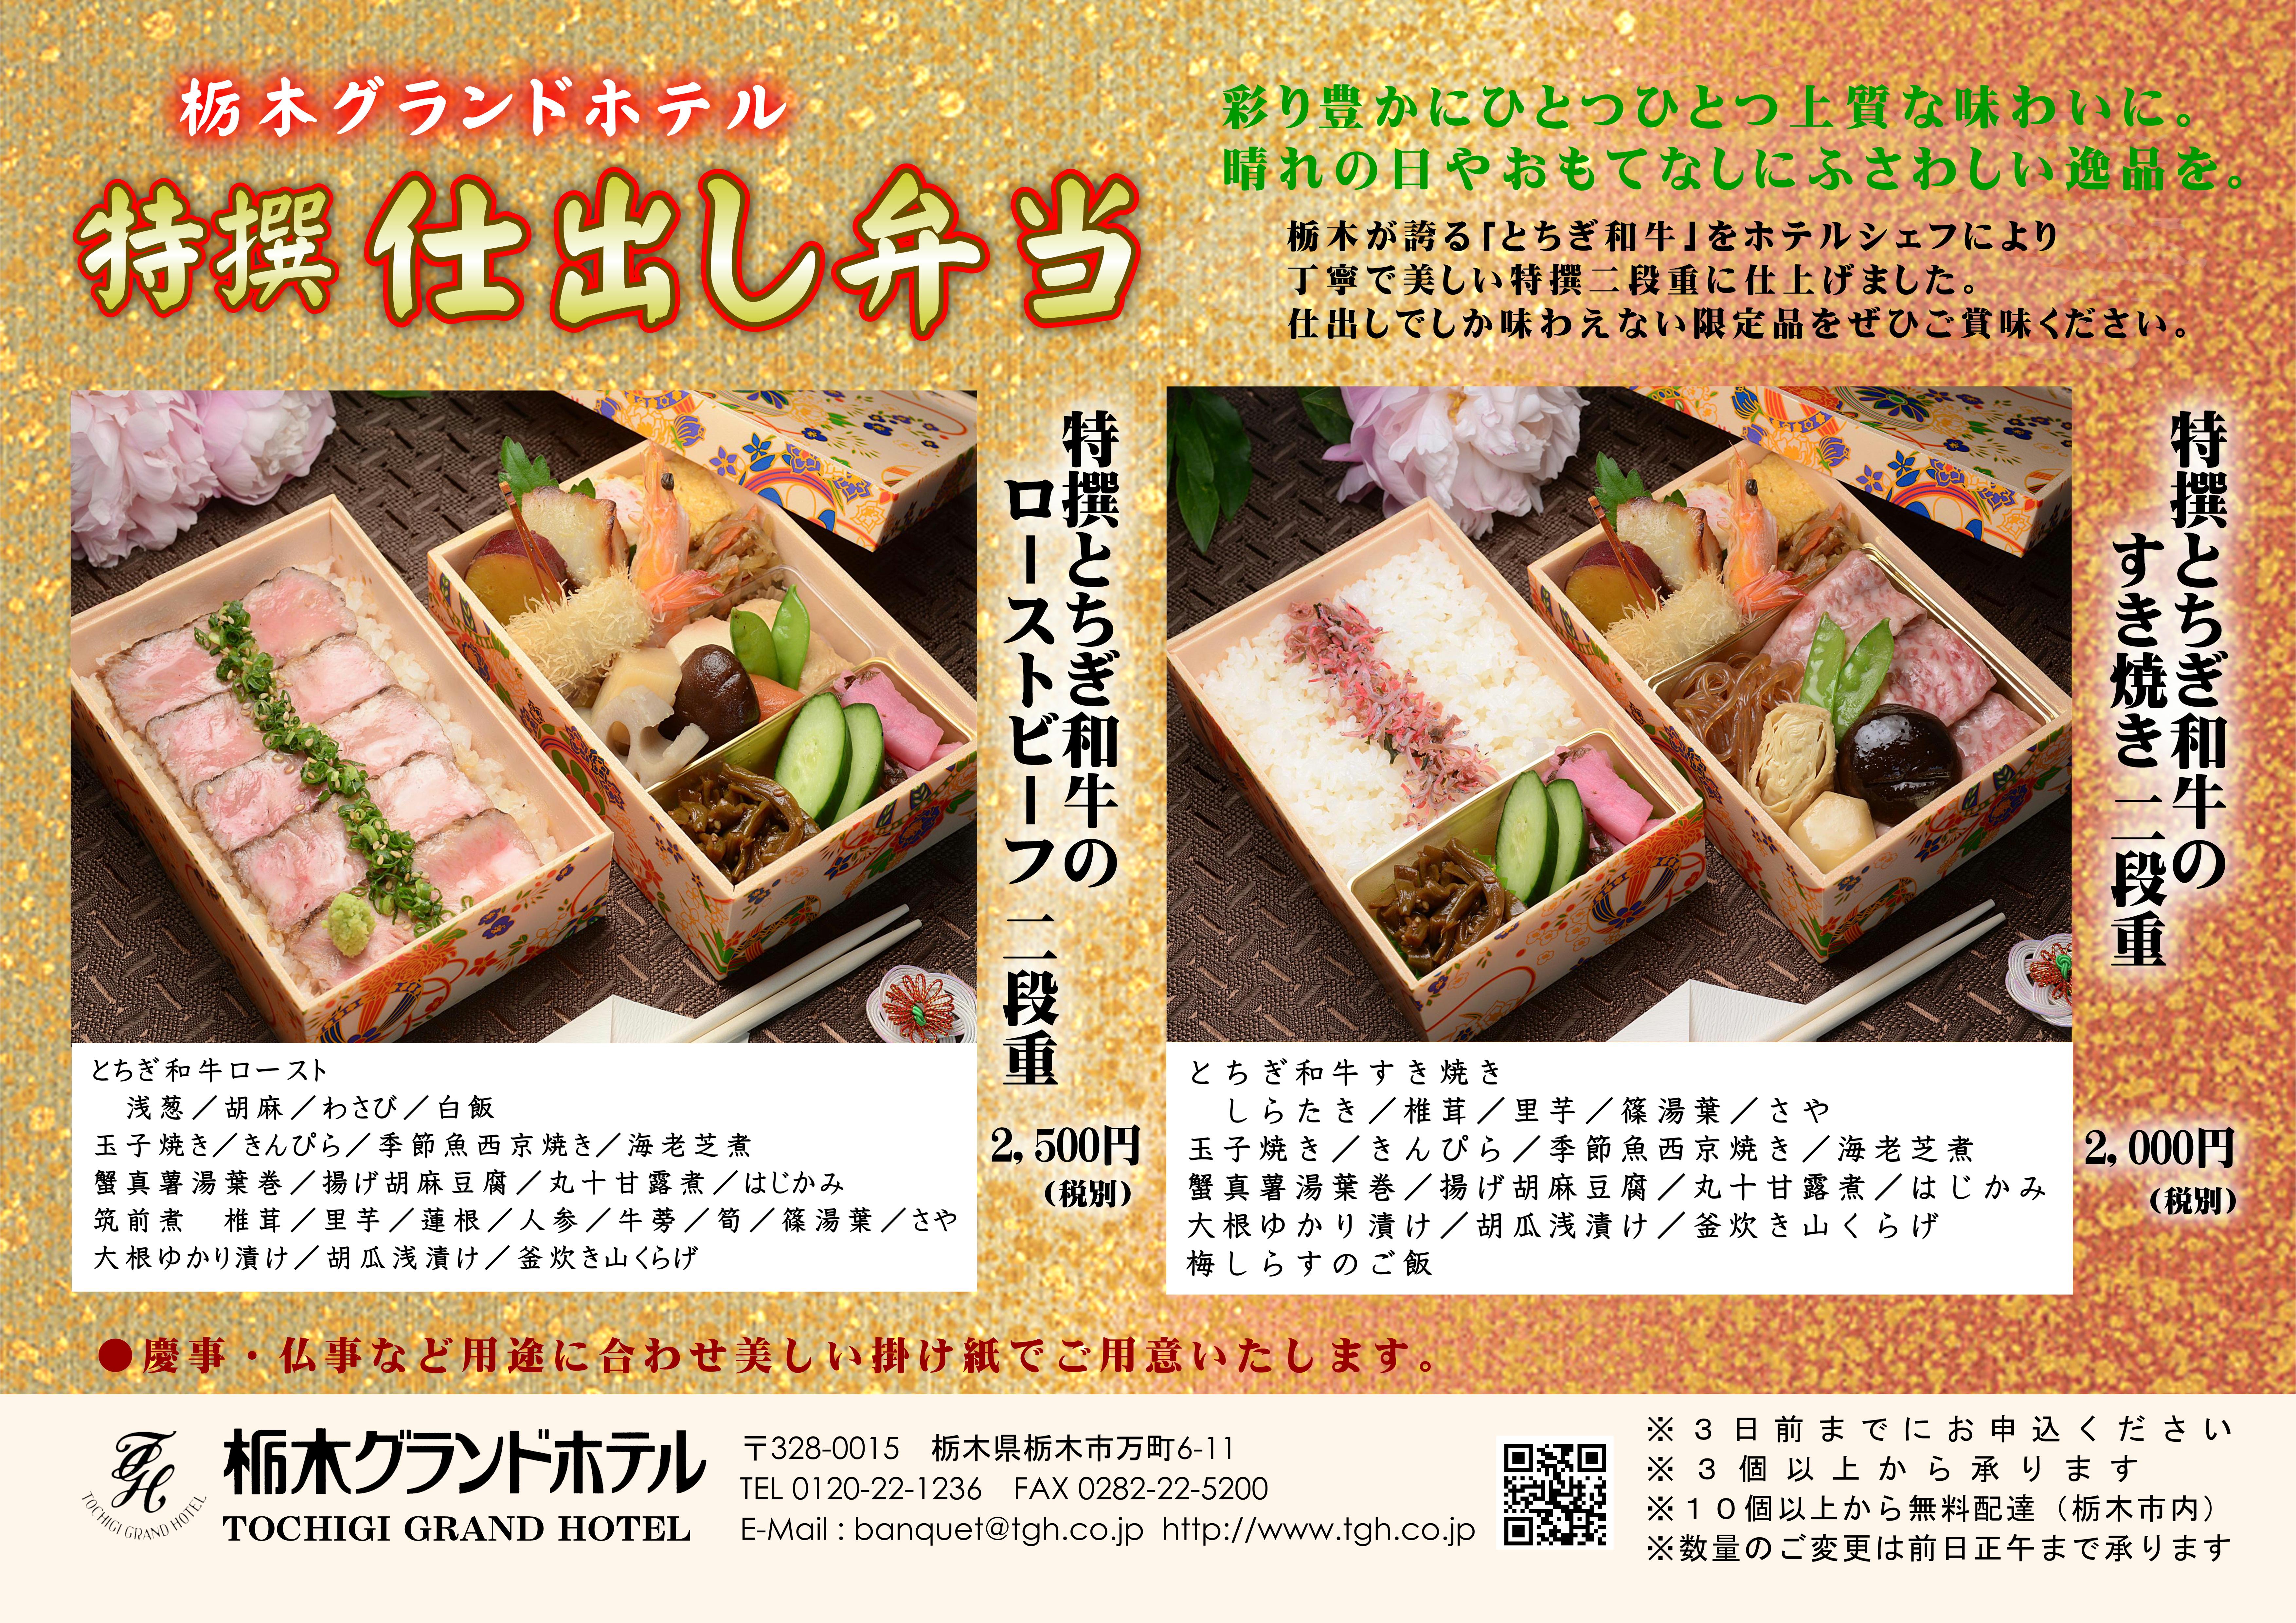 http://www.tgh.co.jp/contents/news/%E5%BC%81%E5%BD%93.JPG